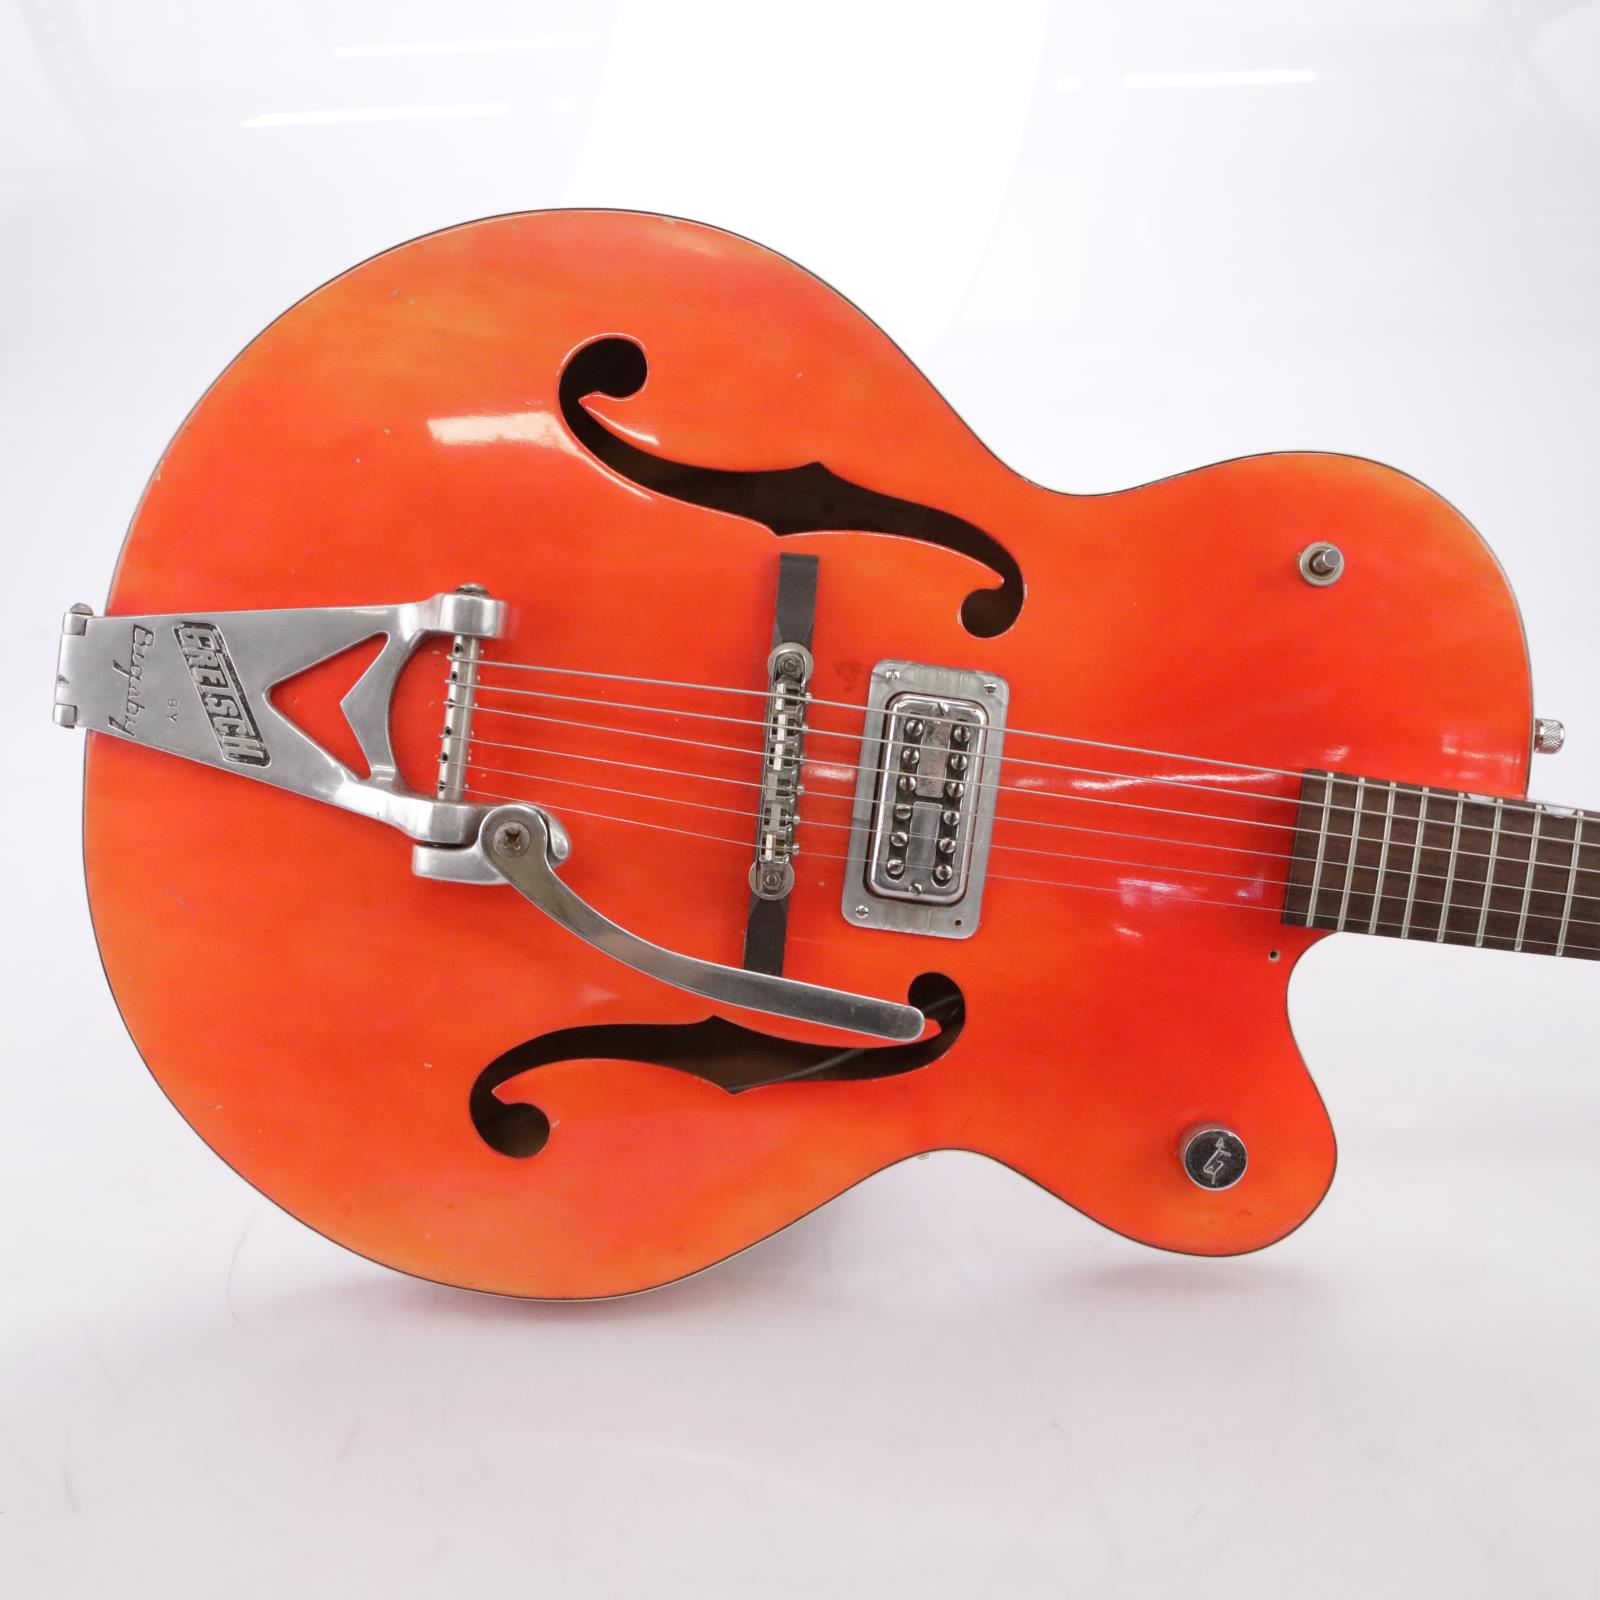 Vintage 1961 Gretsch 6119 Chet Atkins Hollowbody Electric Guitar w/ Case #44214